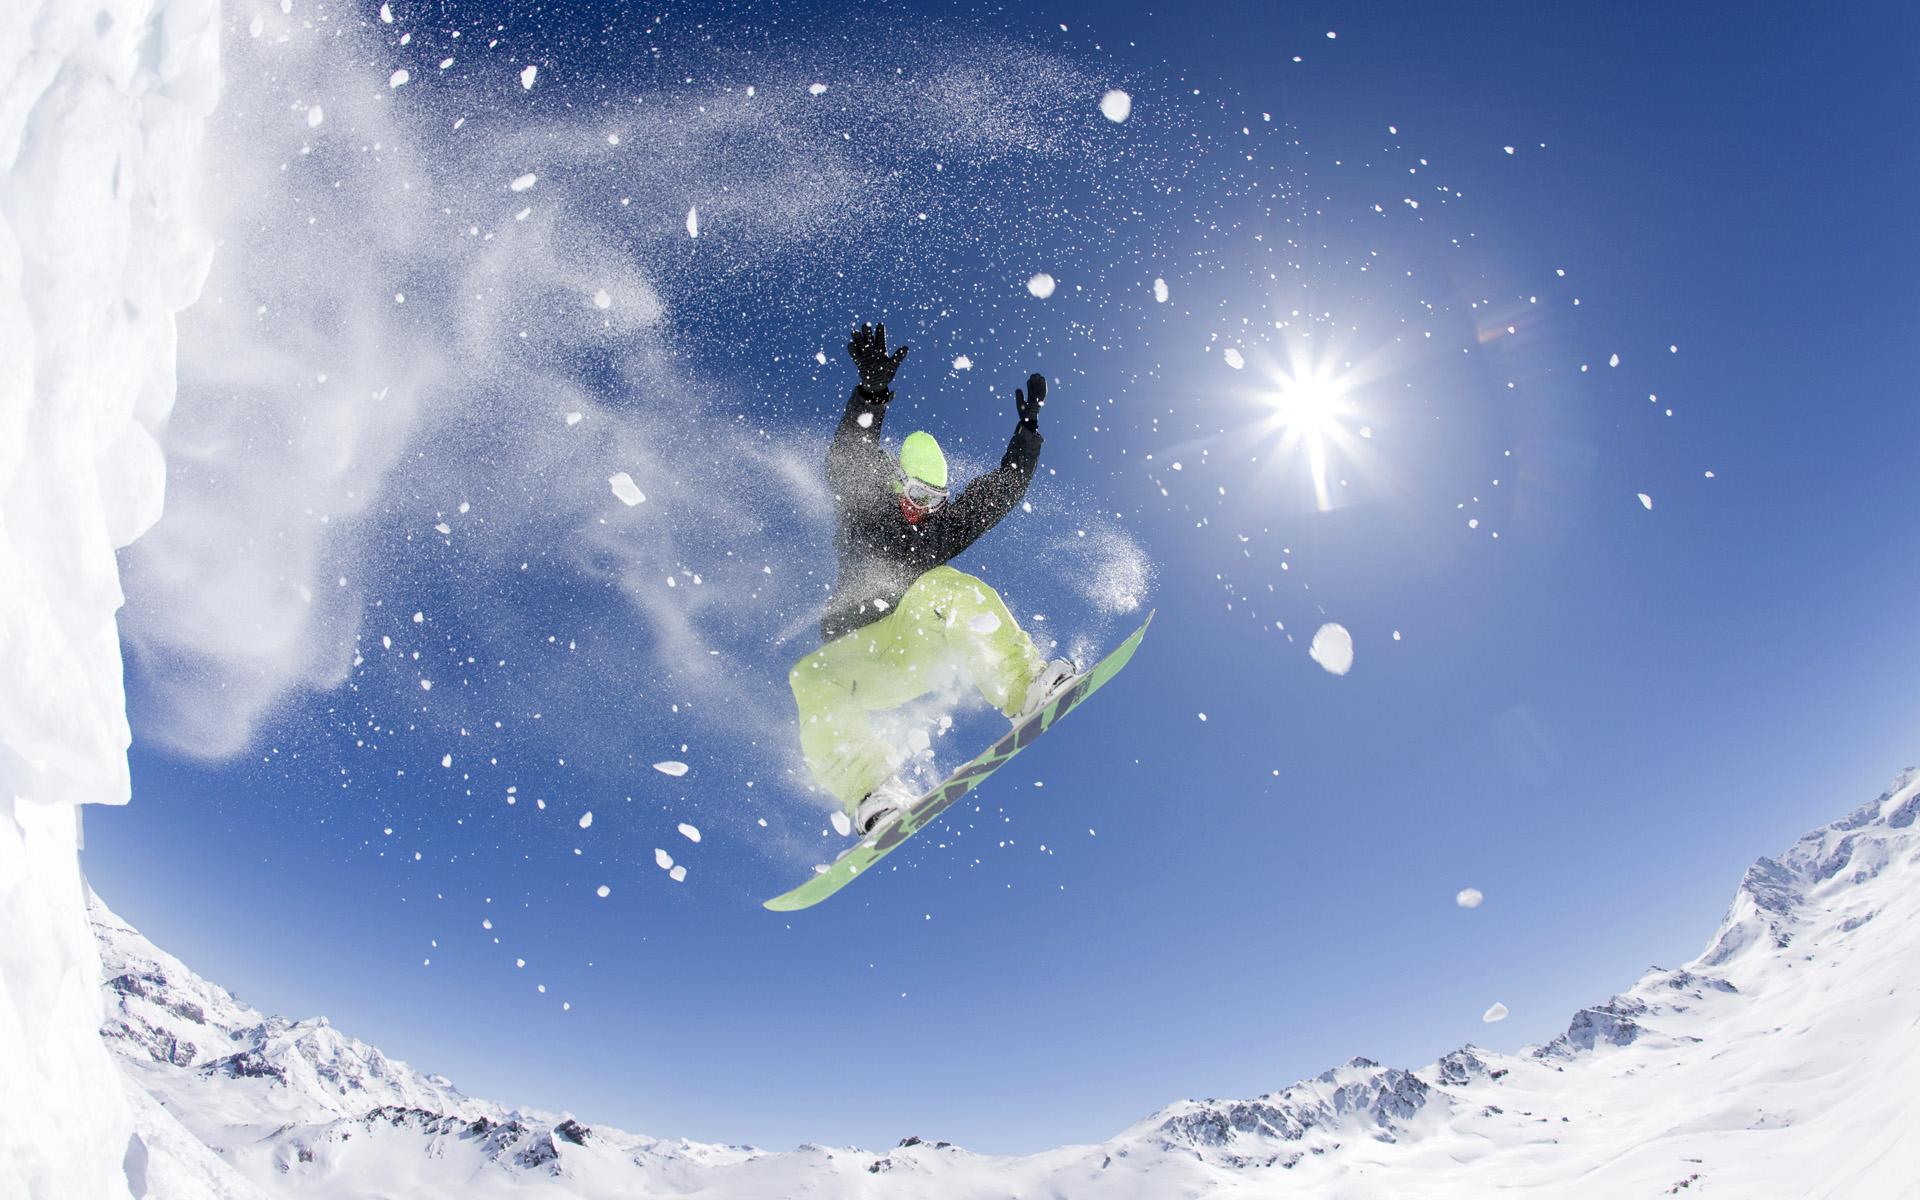 http://4.bp.blogspot.com/-E9MOi17qxeQ/Tq_NBUhcVOI/AAAAAAAAZu0/UwdEcTDhDDg/d/snow%2520extreme%2520sports%2520wallpapers%25201920x1200%2520(3).jpg